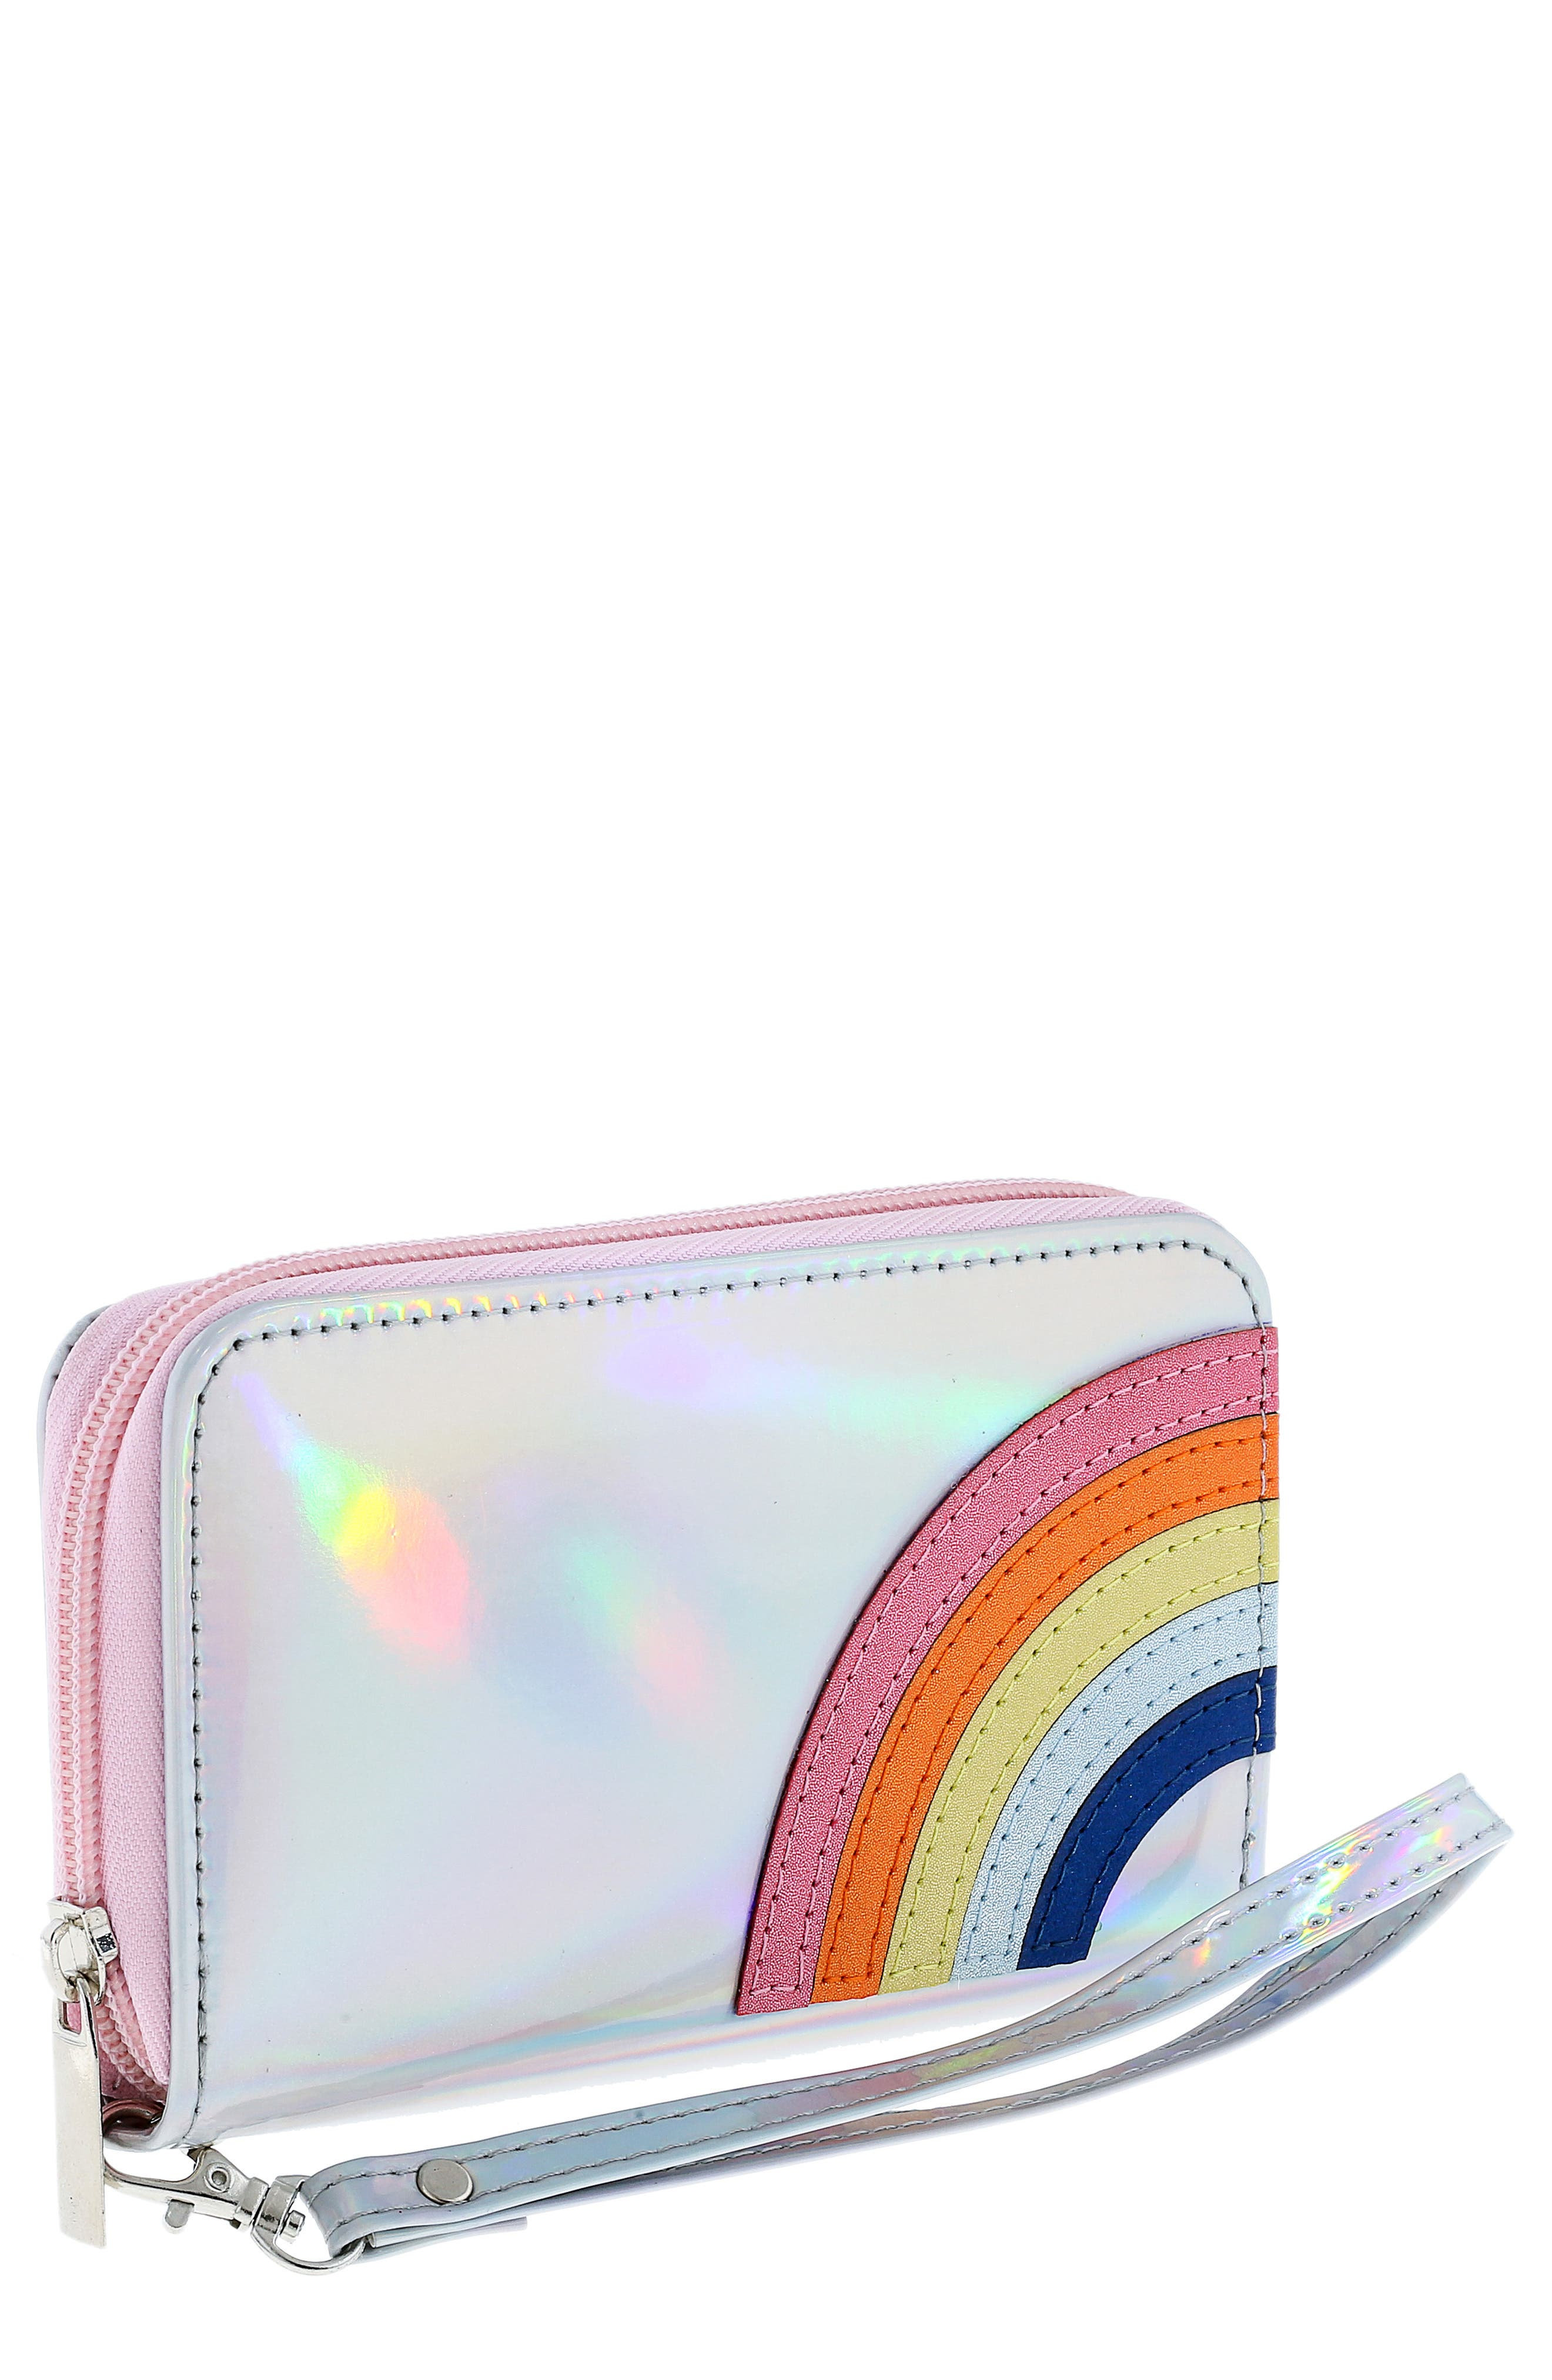 Girls Capelli New York Rainbow Holographic Wristlet  Metallic